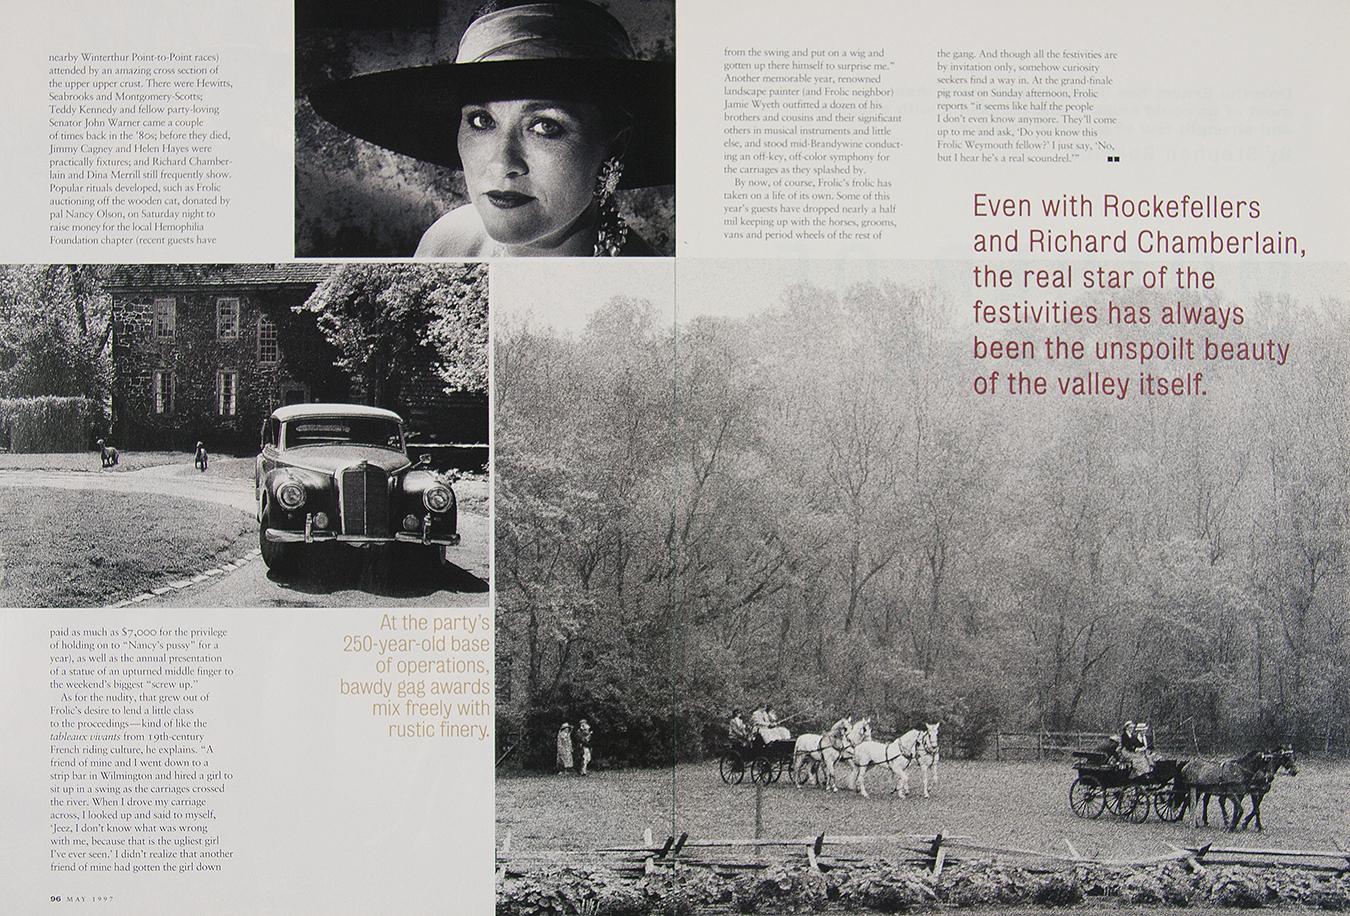 Tony_Ward_photography_editorial_assignment_frolic_weymouth_philadelphia_magazine_Jamie_Wyeth_glamour_lifestyle